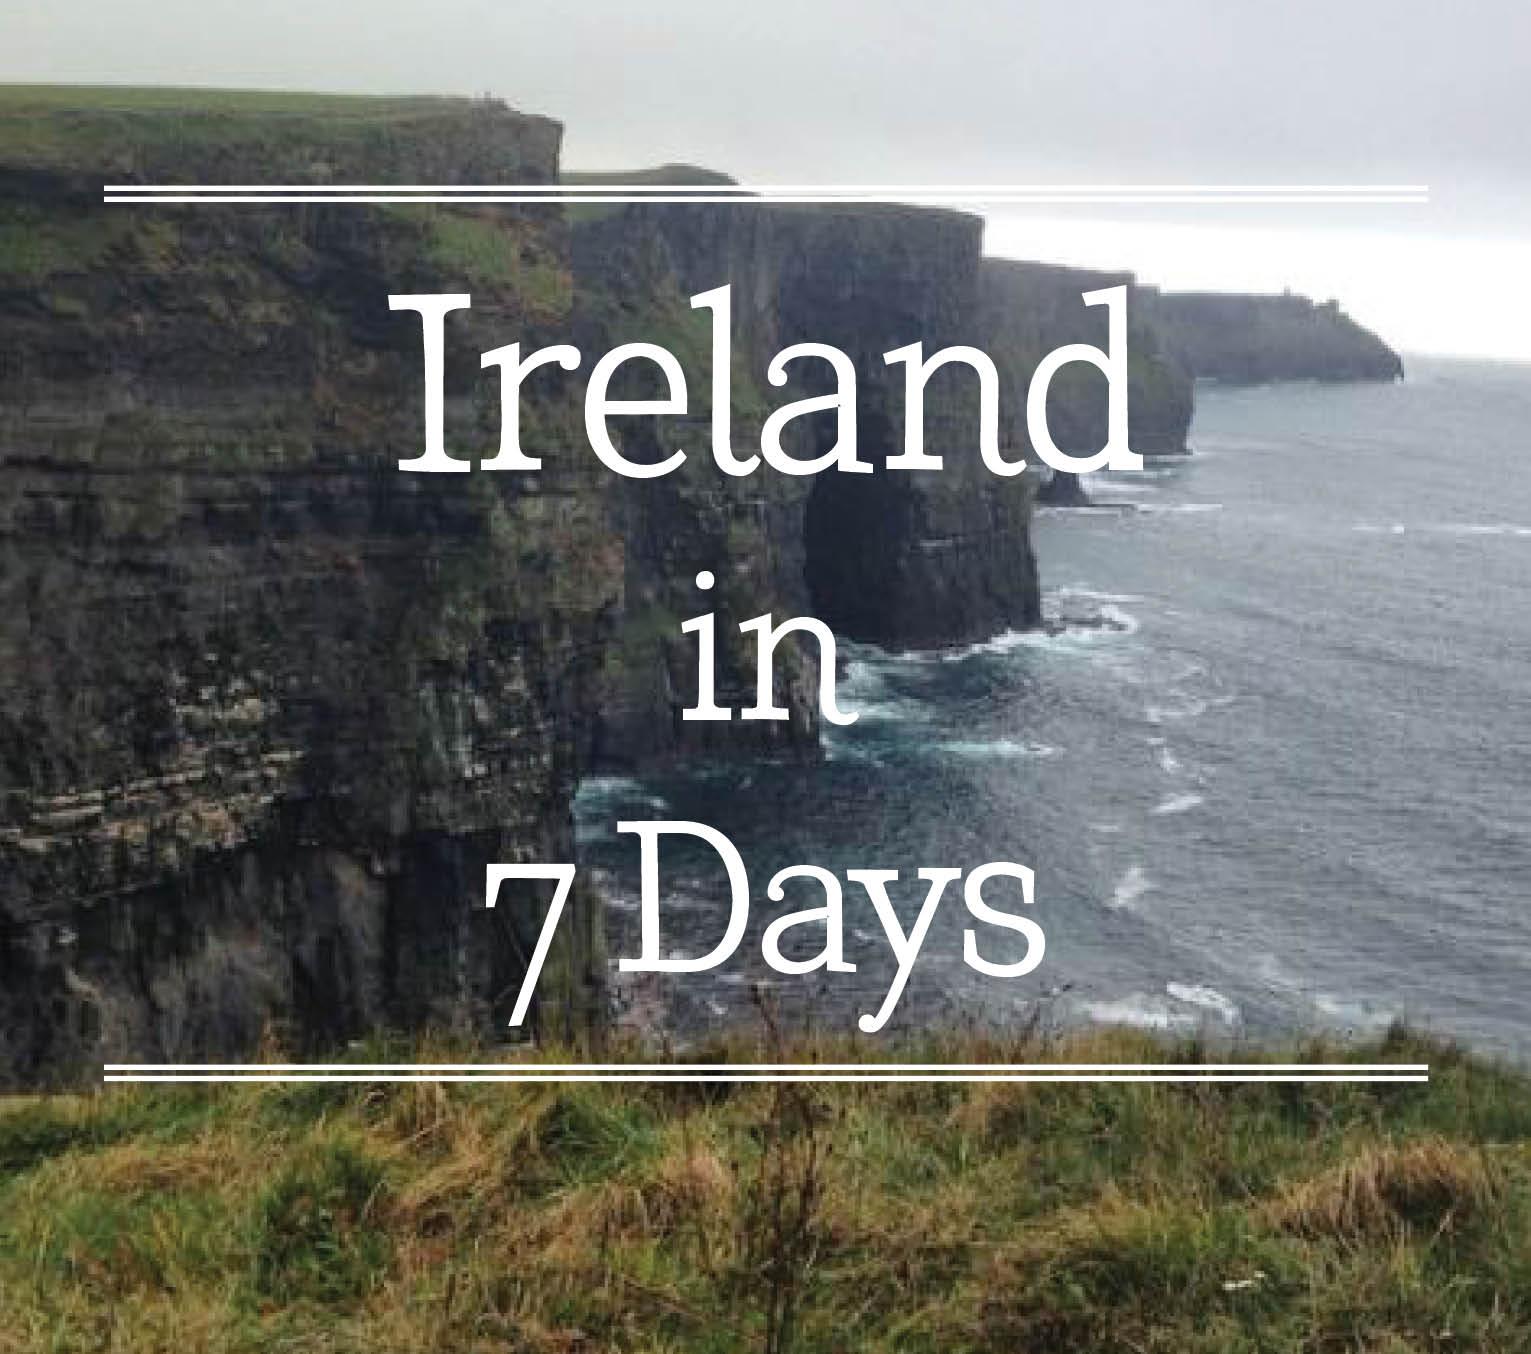 Ireland_7 Days.jpg